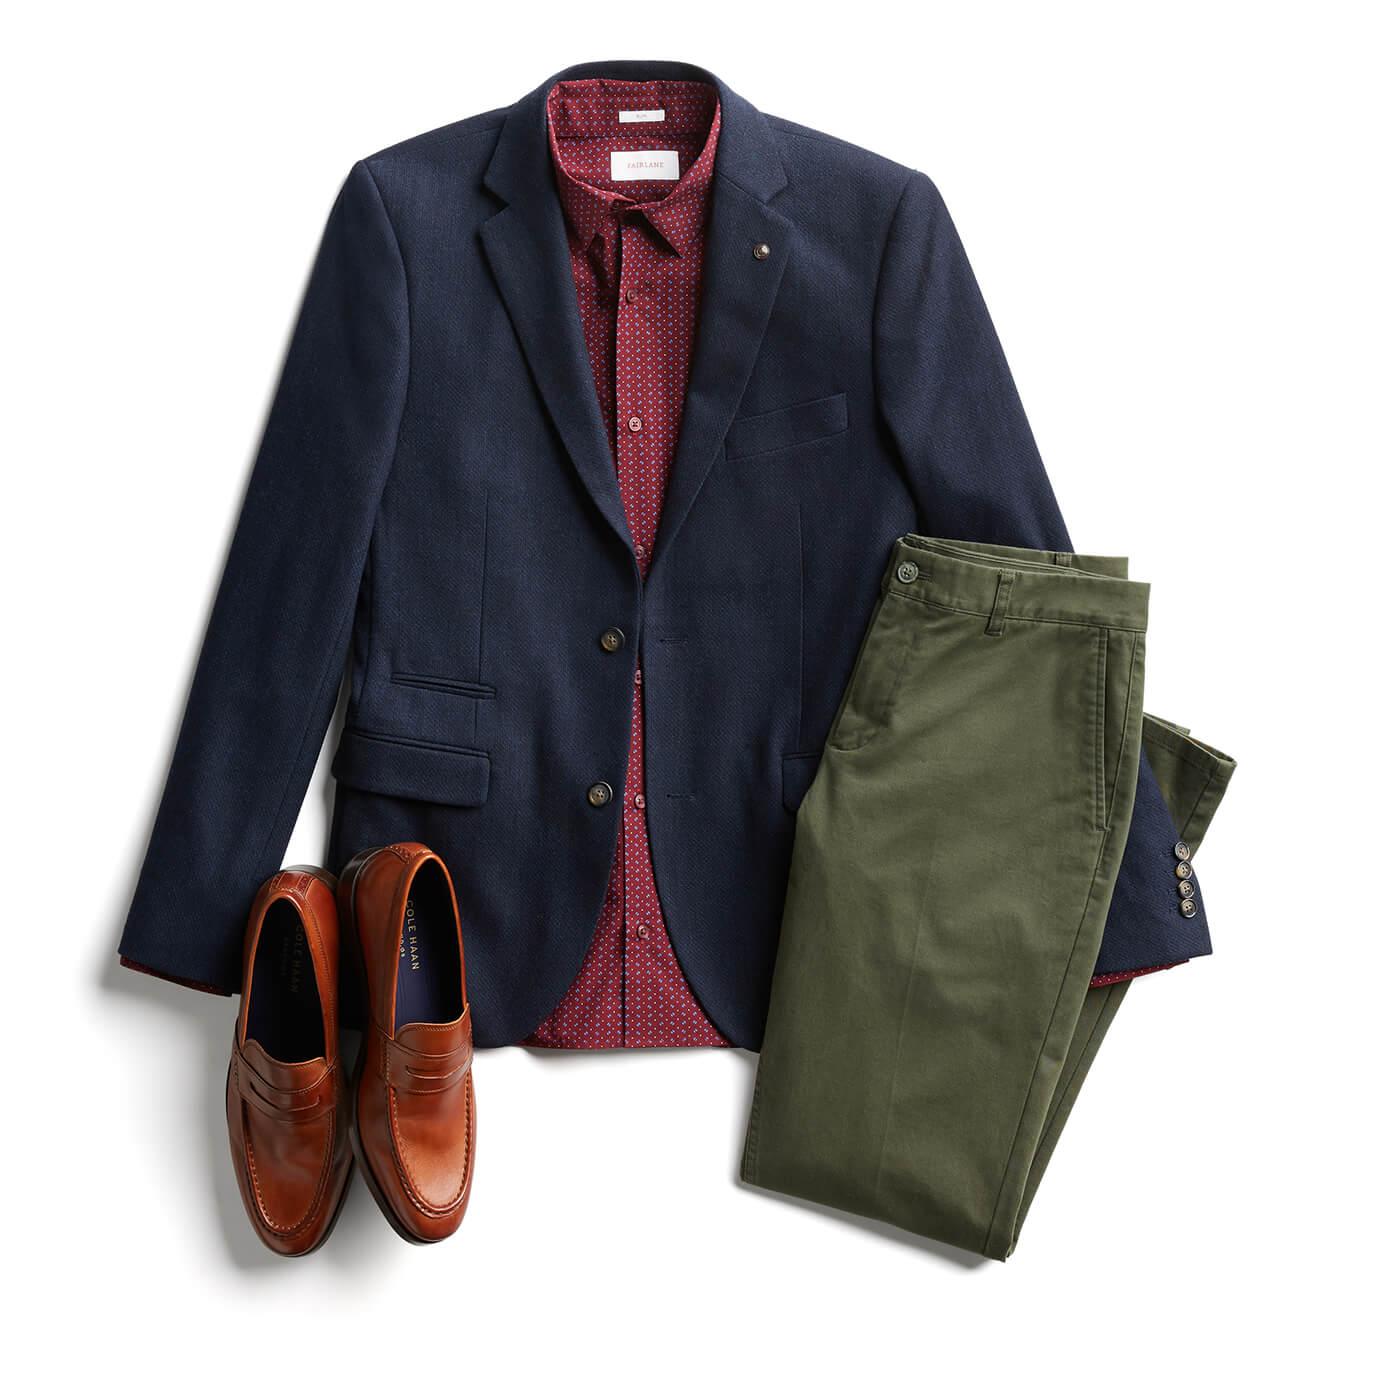 7d46833ce86 How do I build a business casual wardrobe